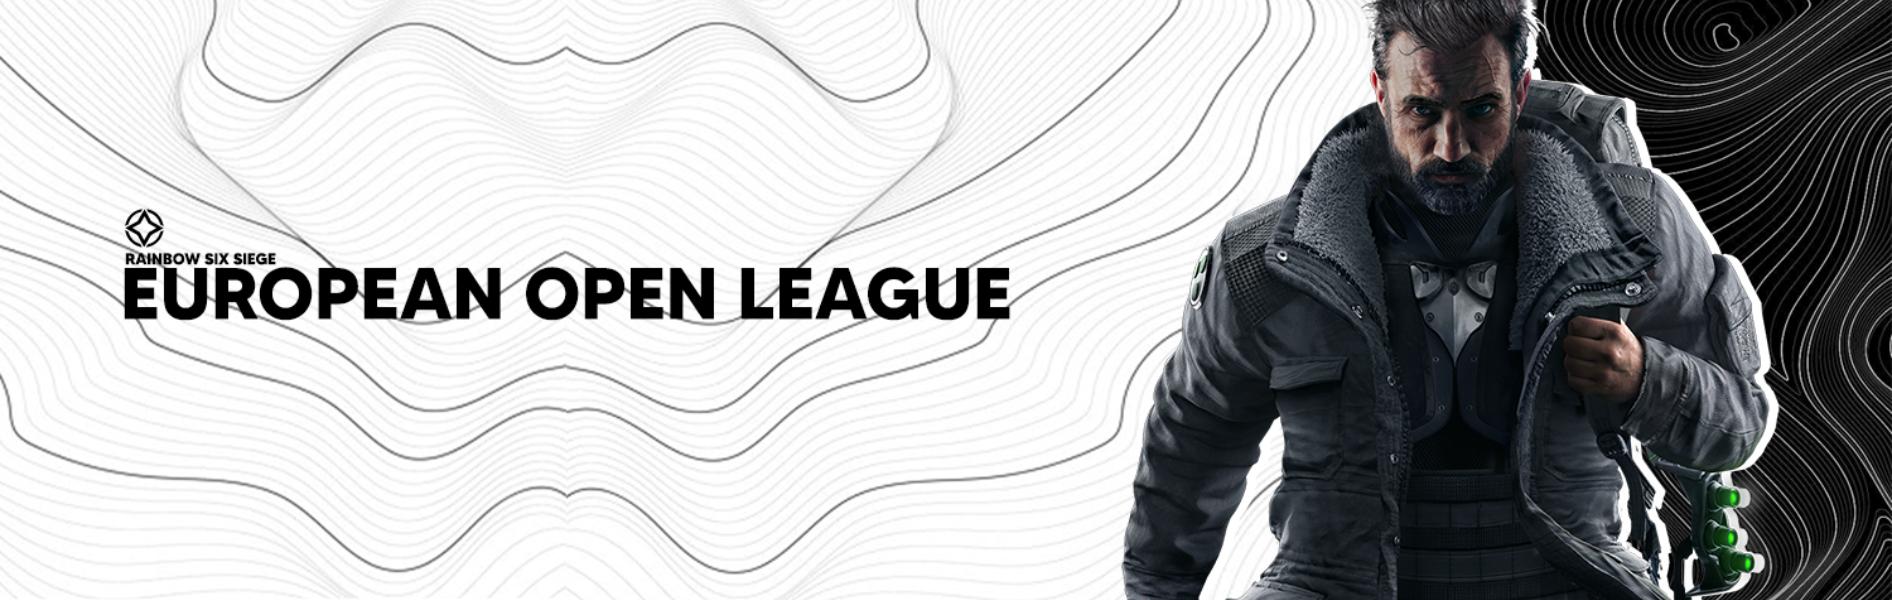 European Open League Banner